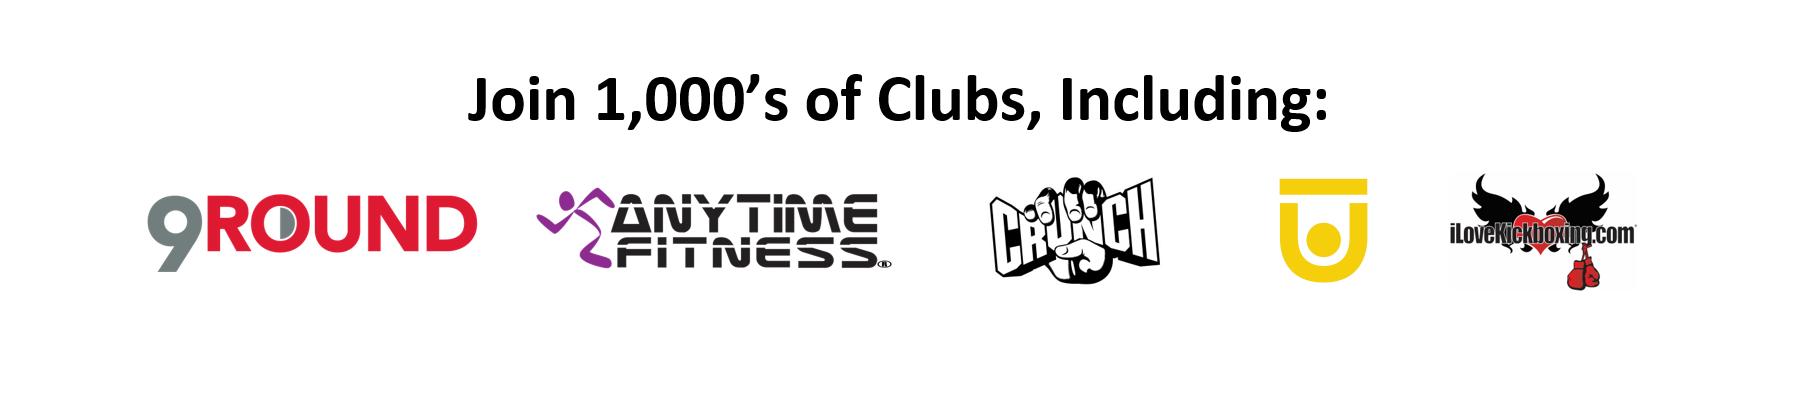 Club Partners-1